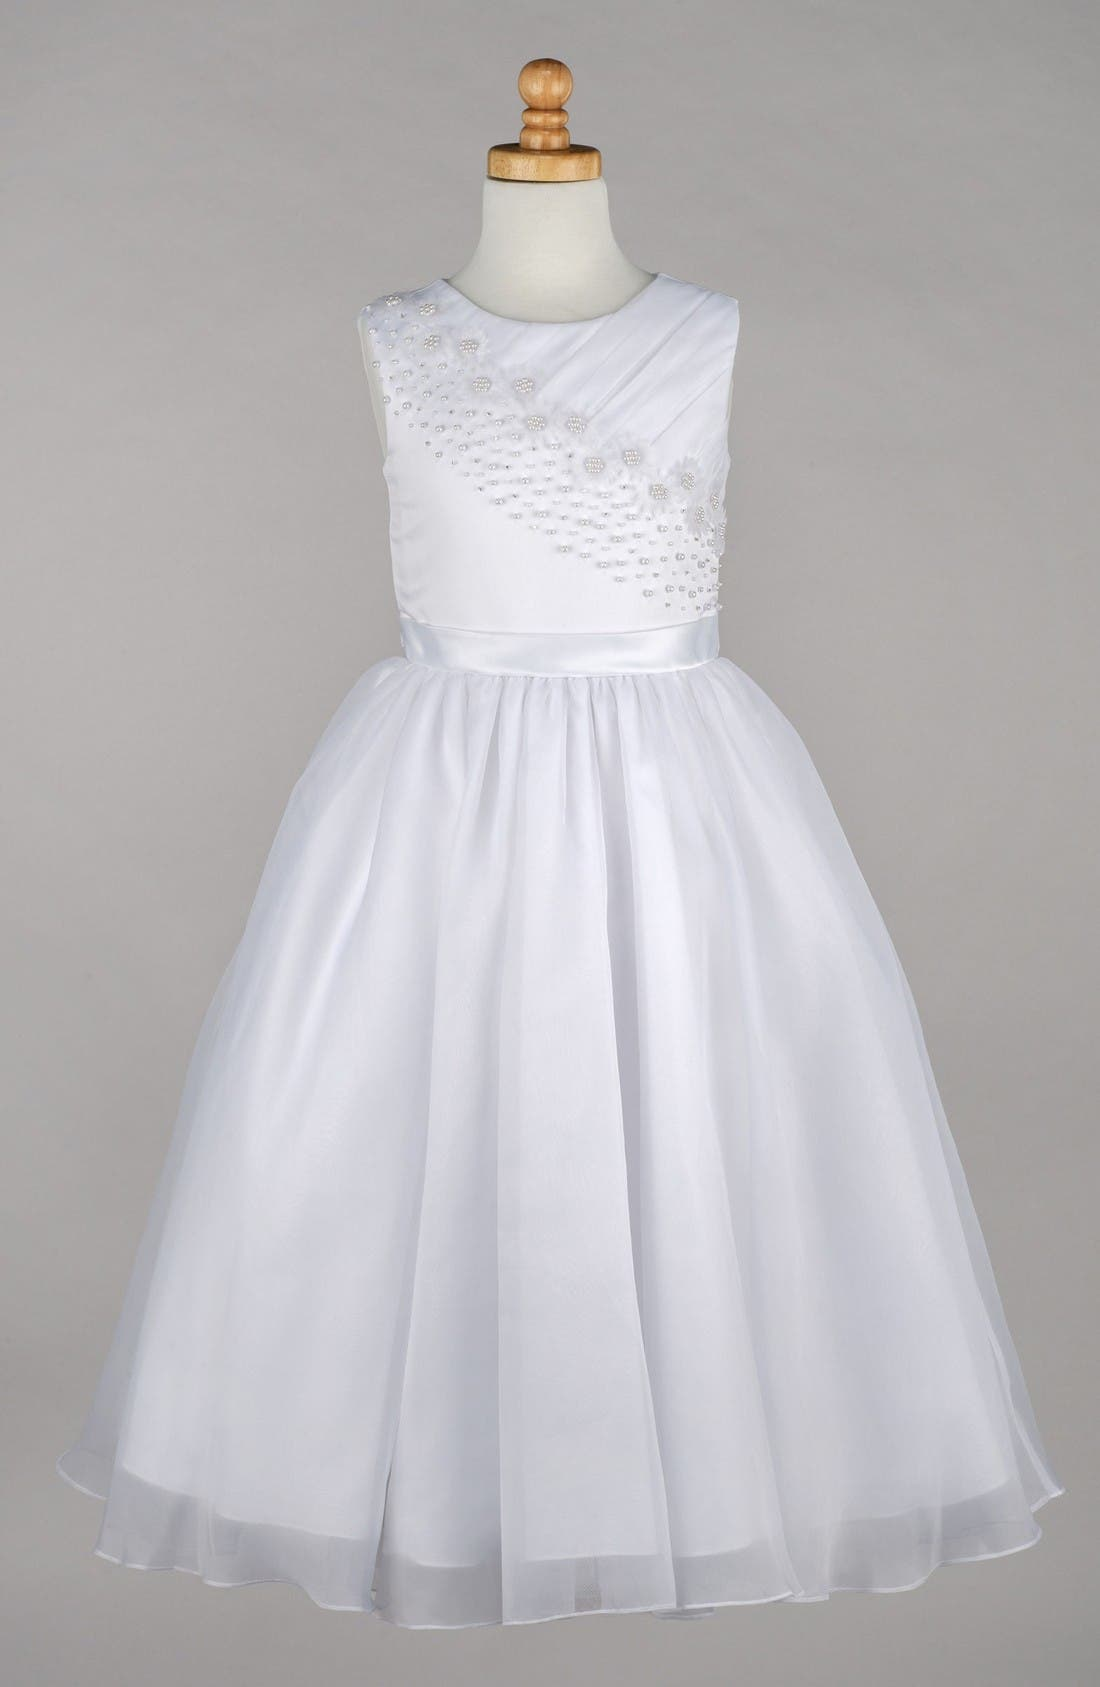 LAUREN MARIE Beaded Daisy Bodice First Communion Dress